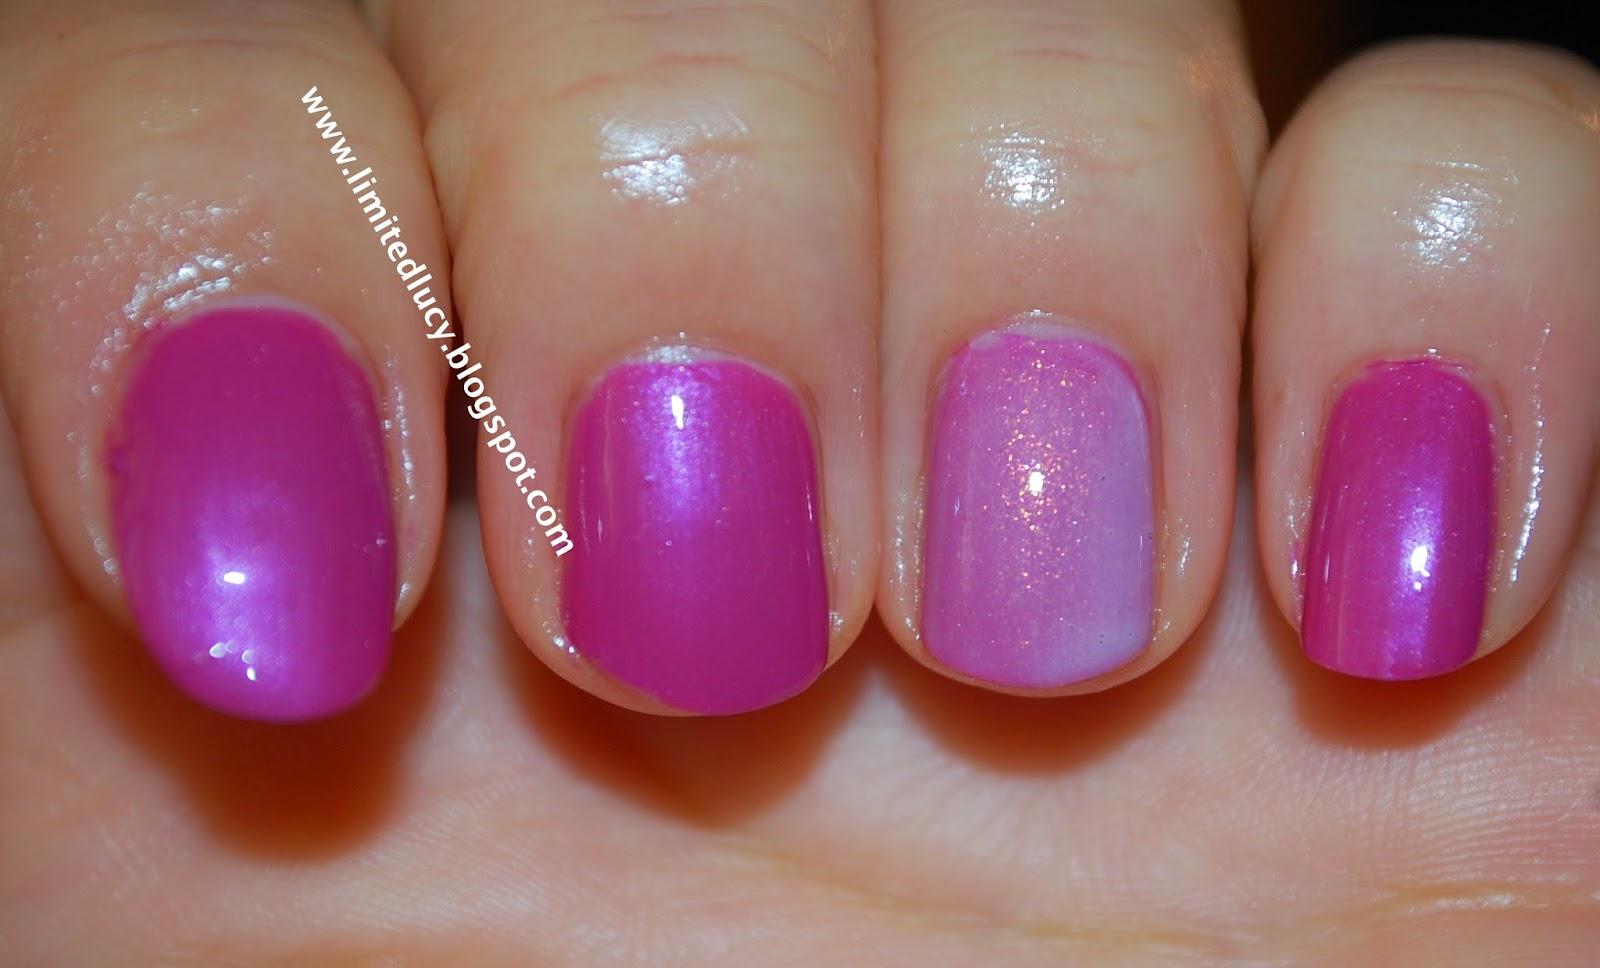 LUCY brb: Inglot O2M Nail Polish - #699 - nail polish swatch